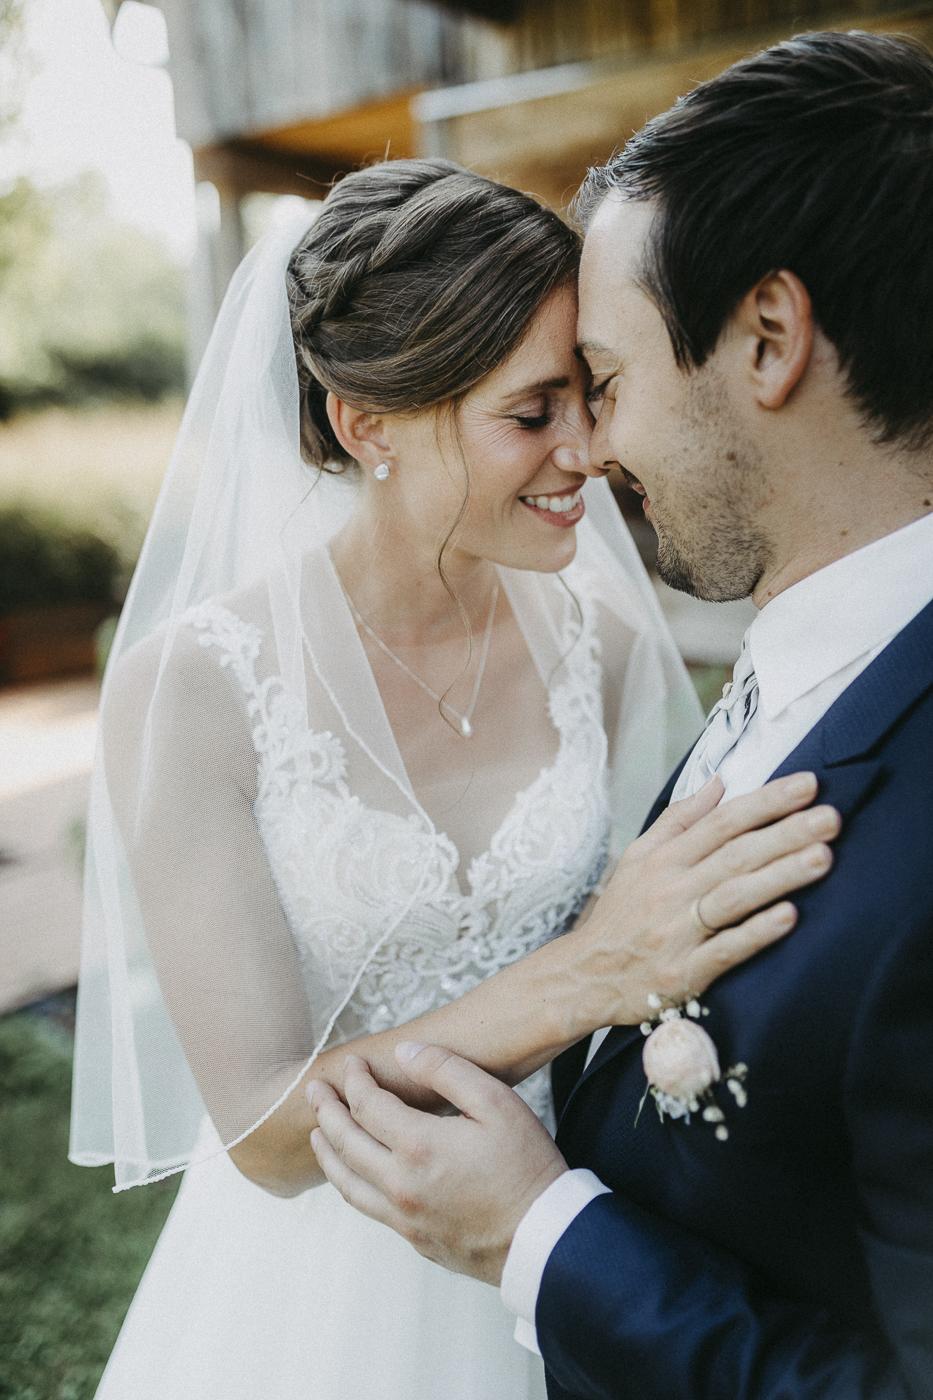 rosemarrylemon_ND_Hochzeit_Hochzeitsplanung6.jpg